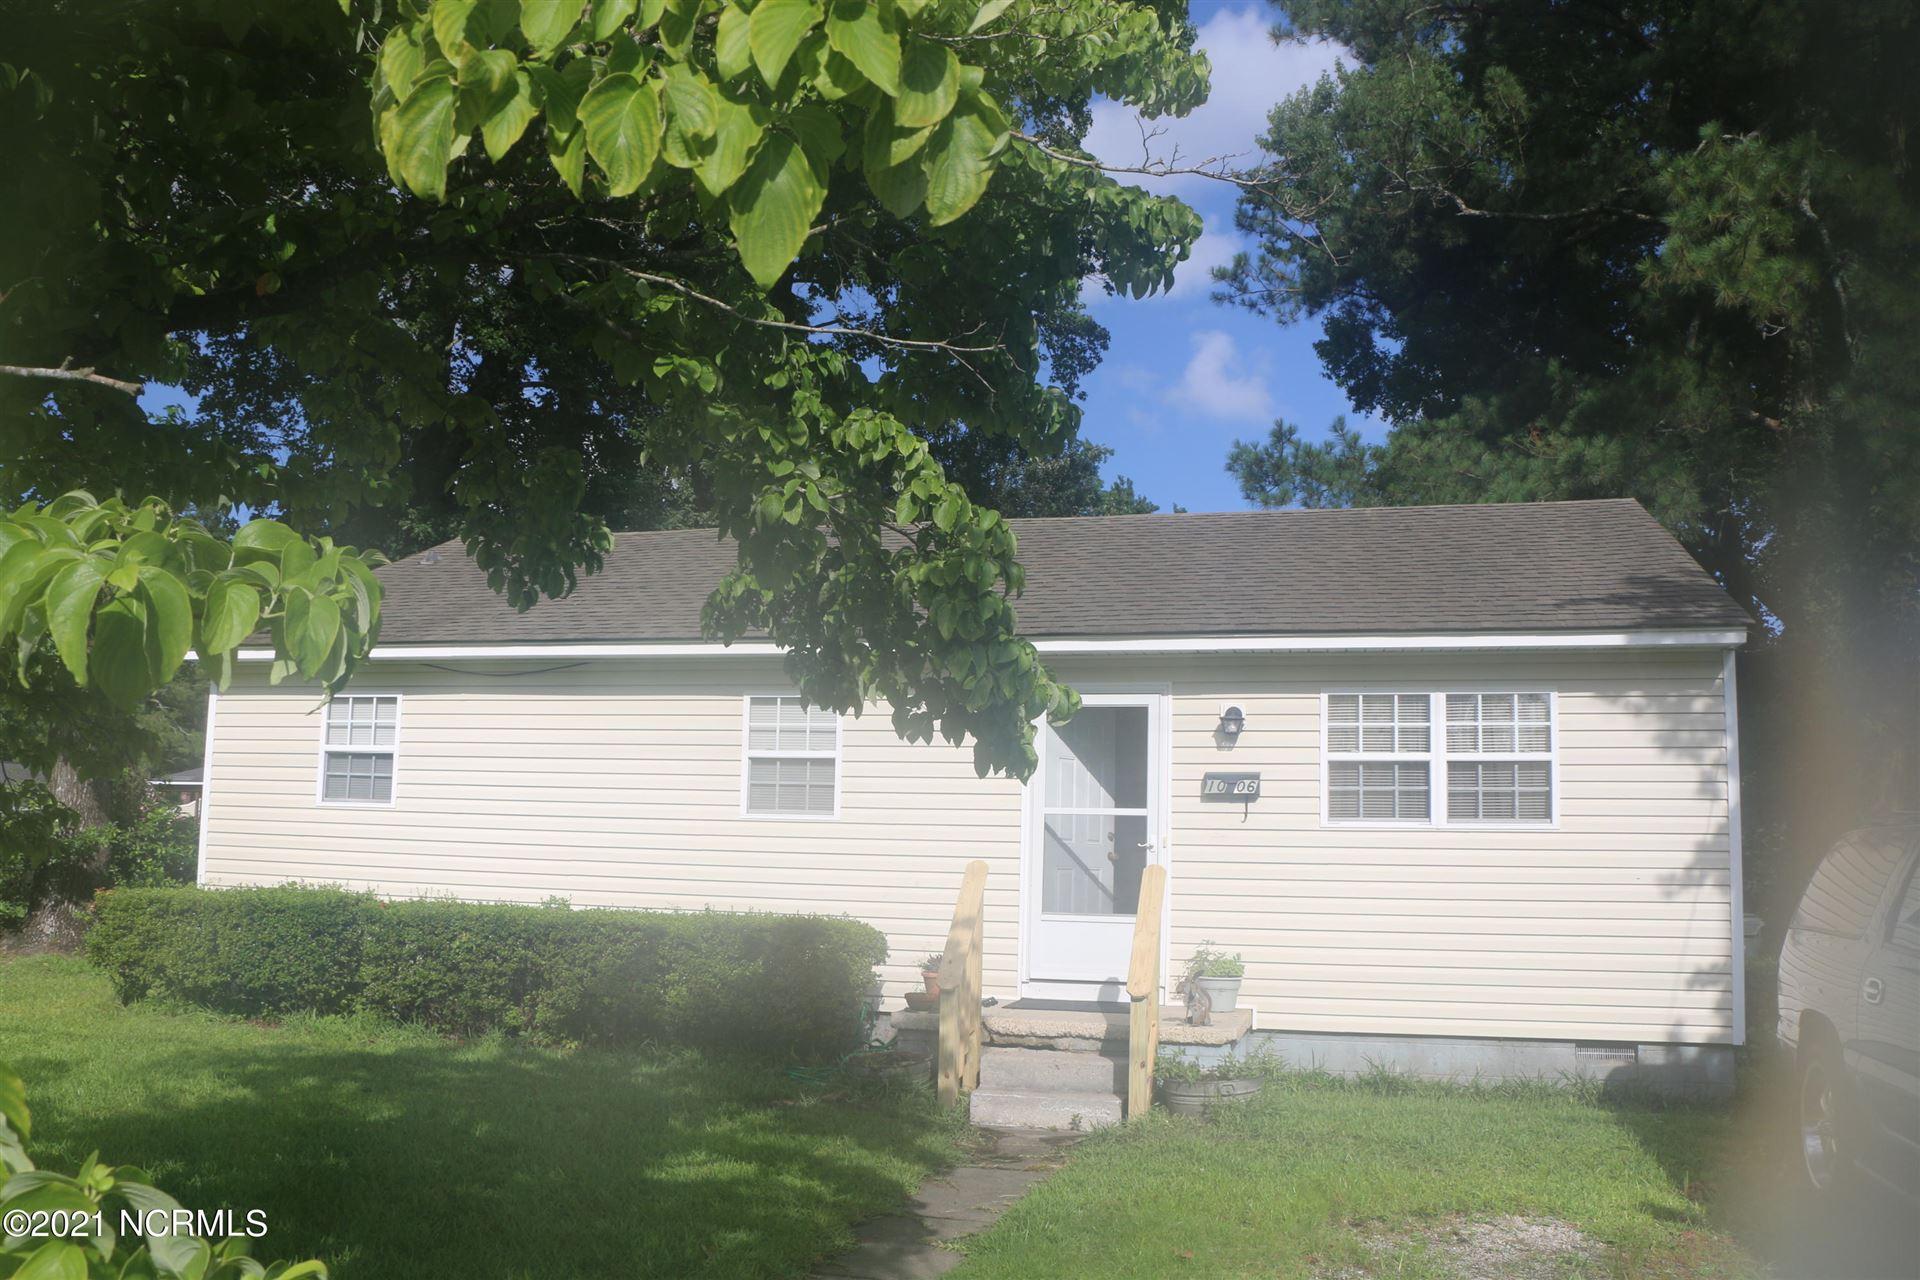 Photo of 1006 Simmons Street, New Bern, NC 28560 (MLS # 100280874)